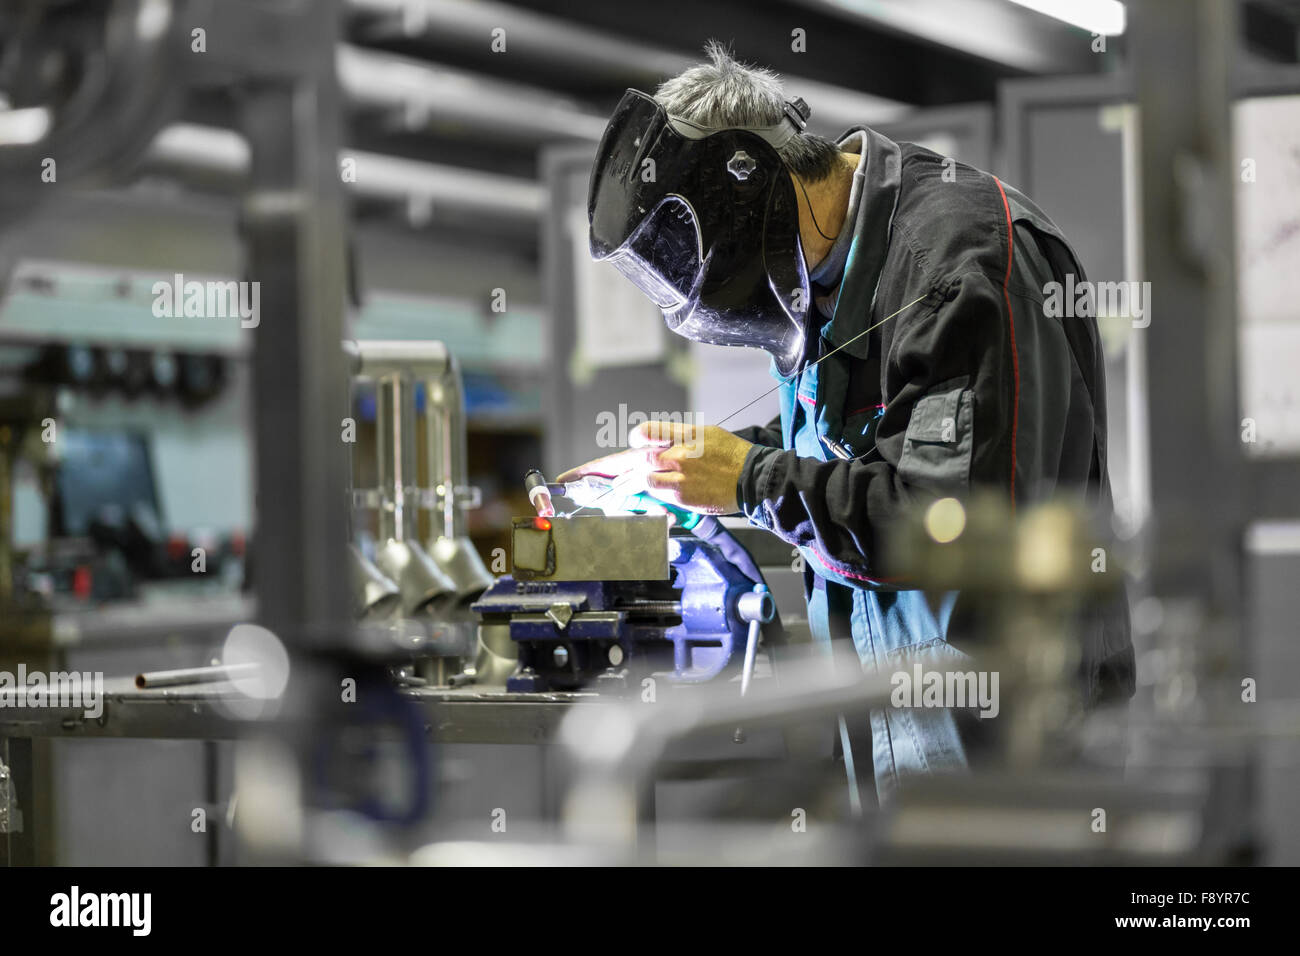 Operaio industriale saldatura in fabbrica di metallo. Immagini Stock